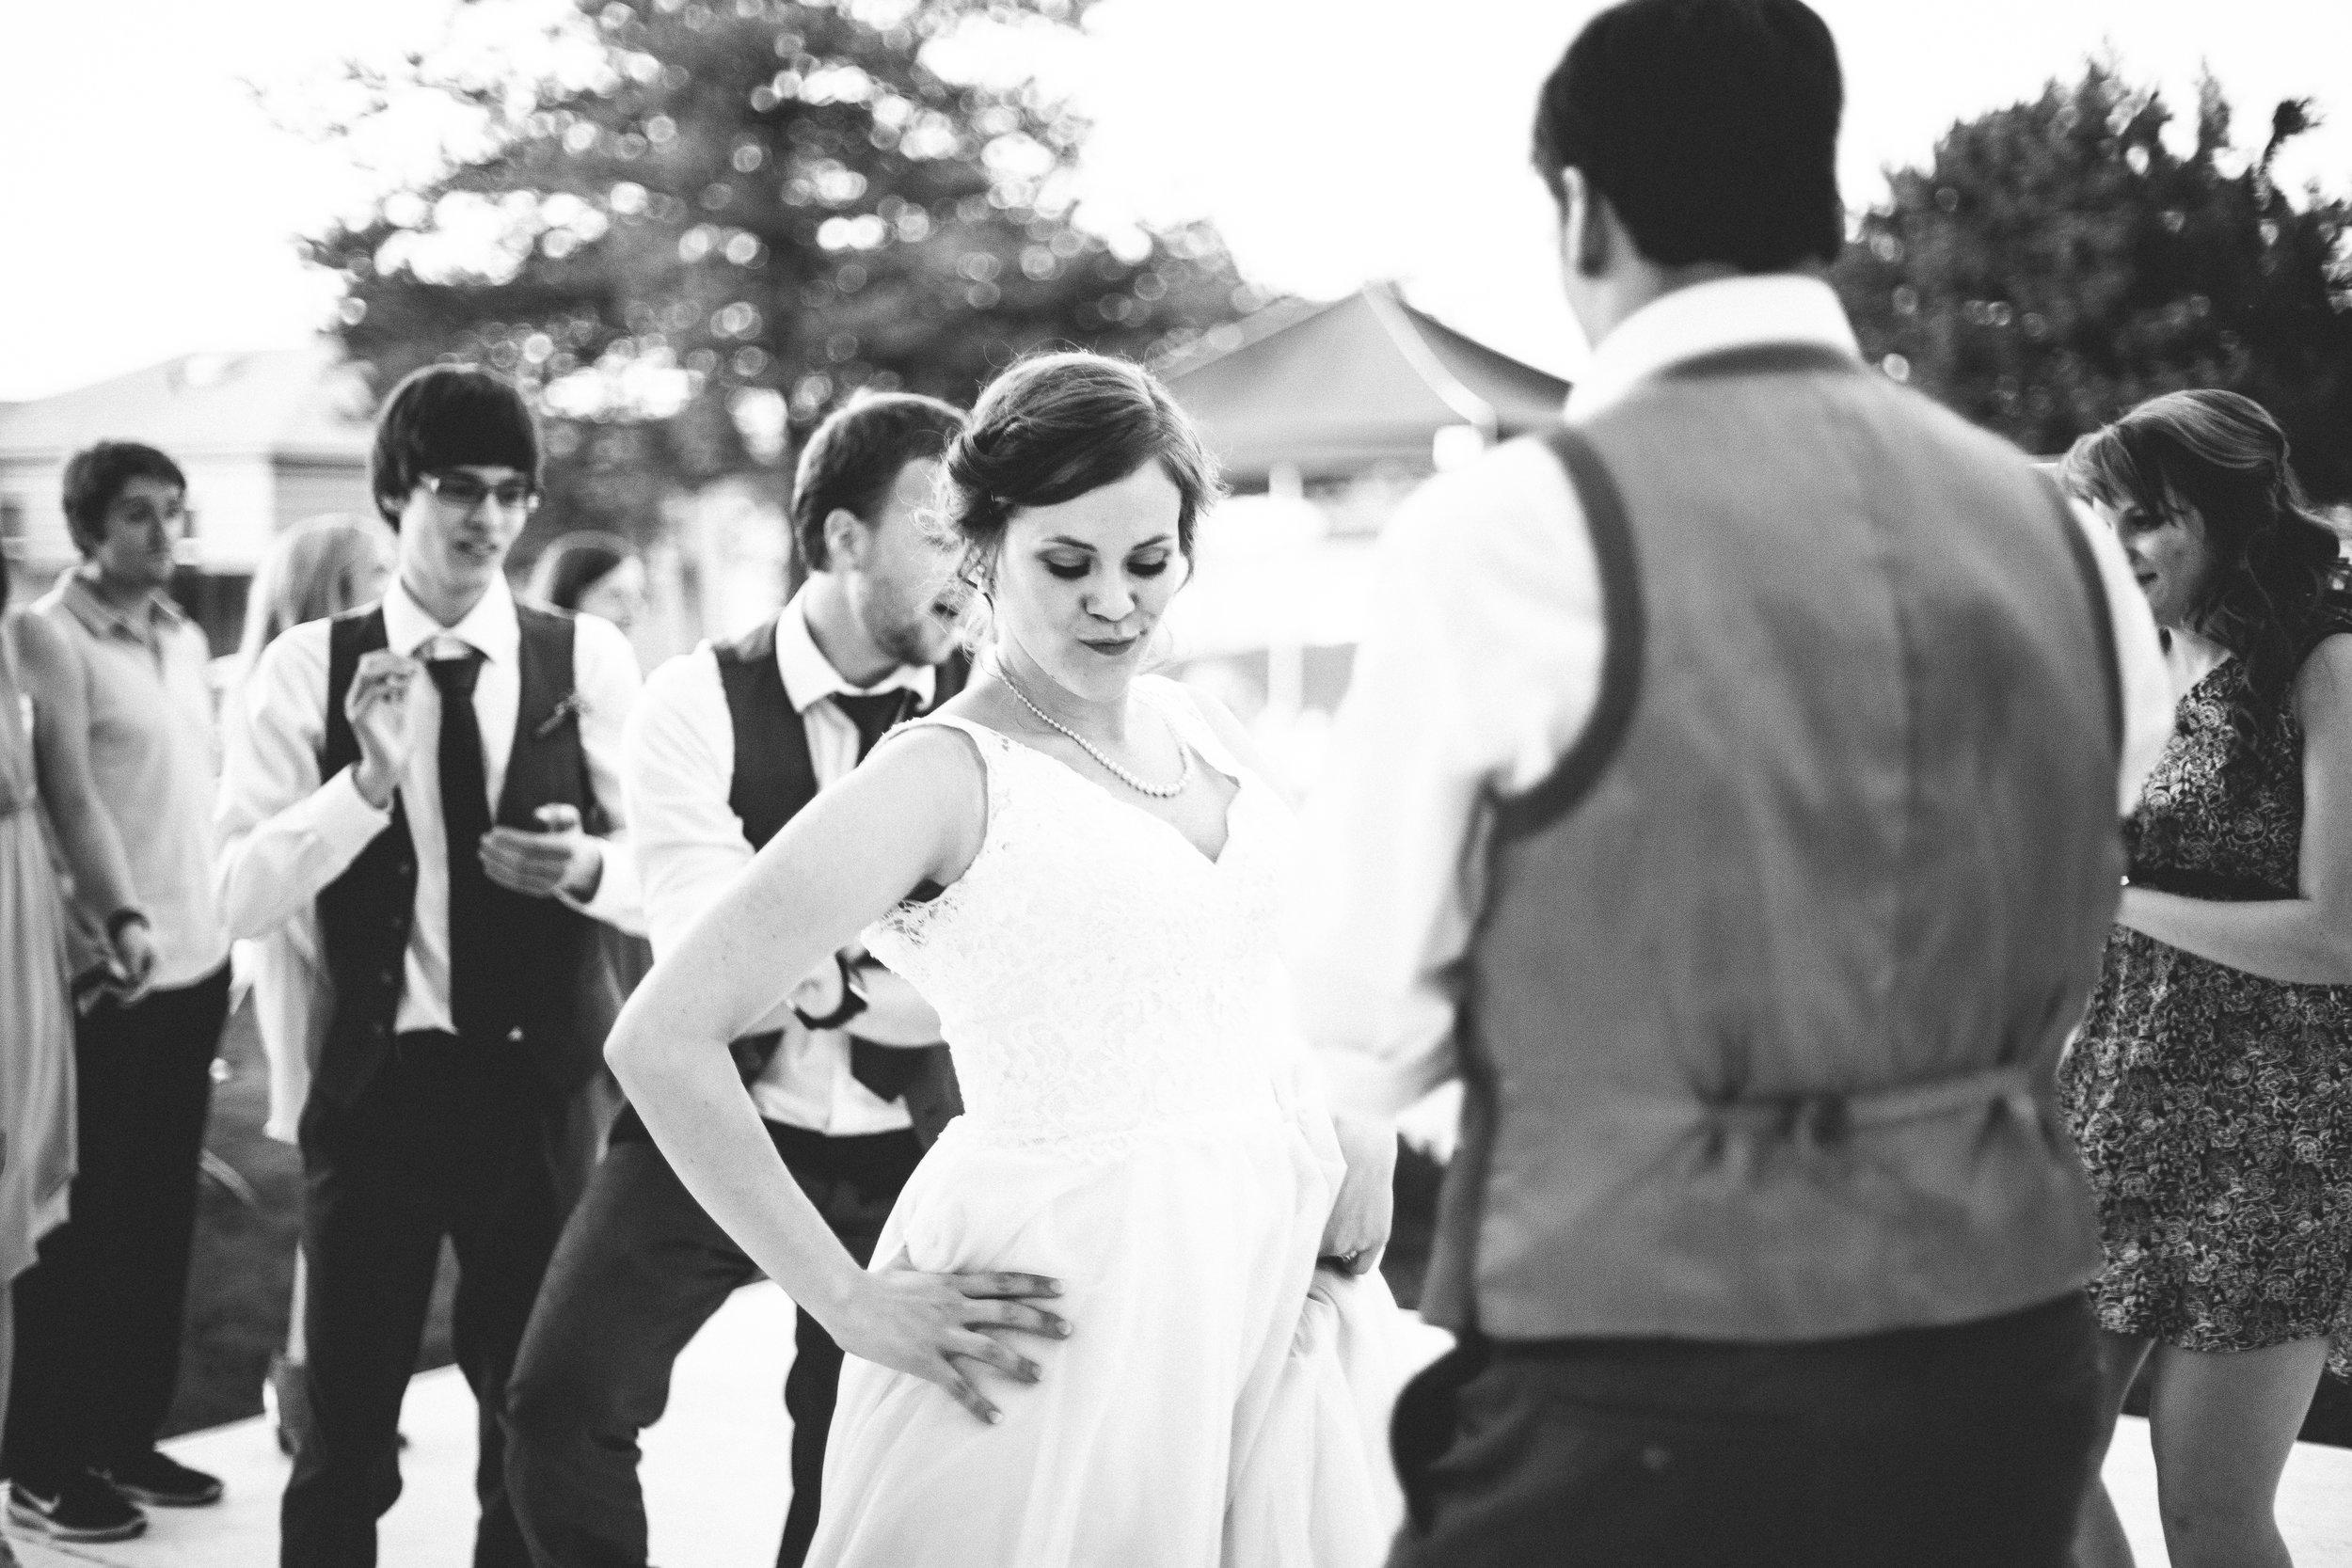 Jordan & Shantel Married - Idaho - Corrie Mick Photography-364.jpg